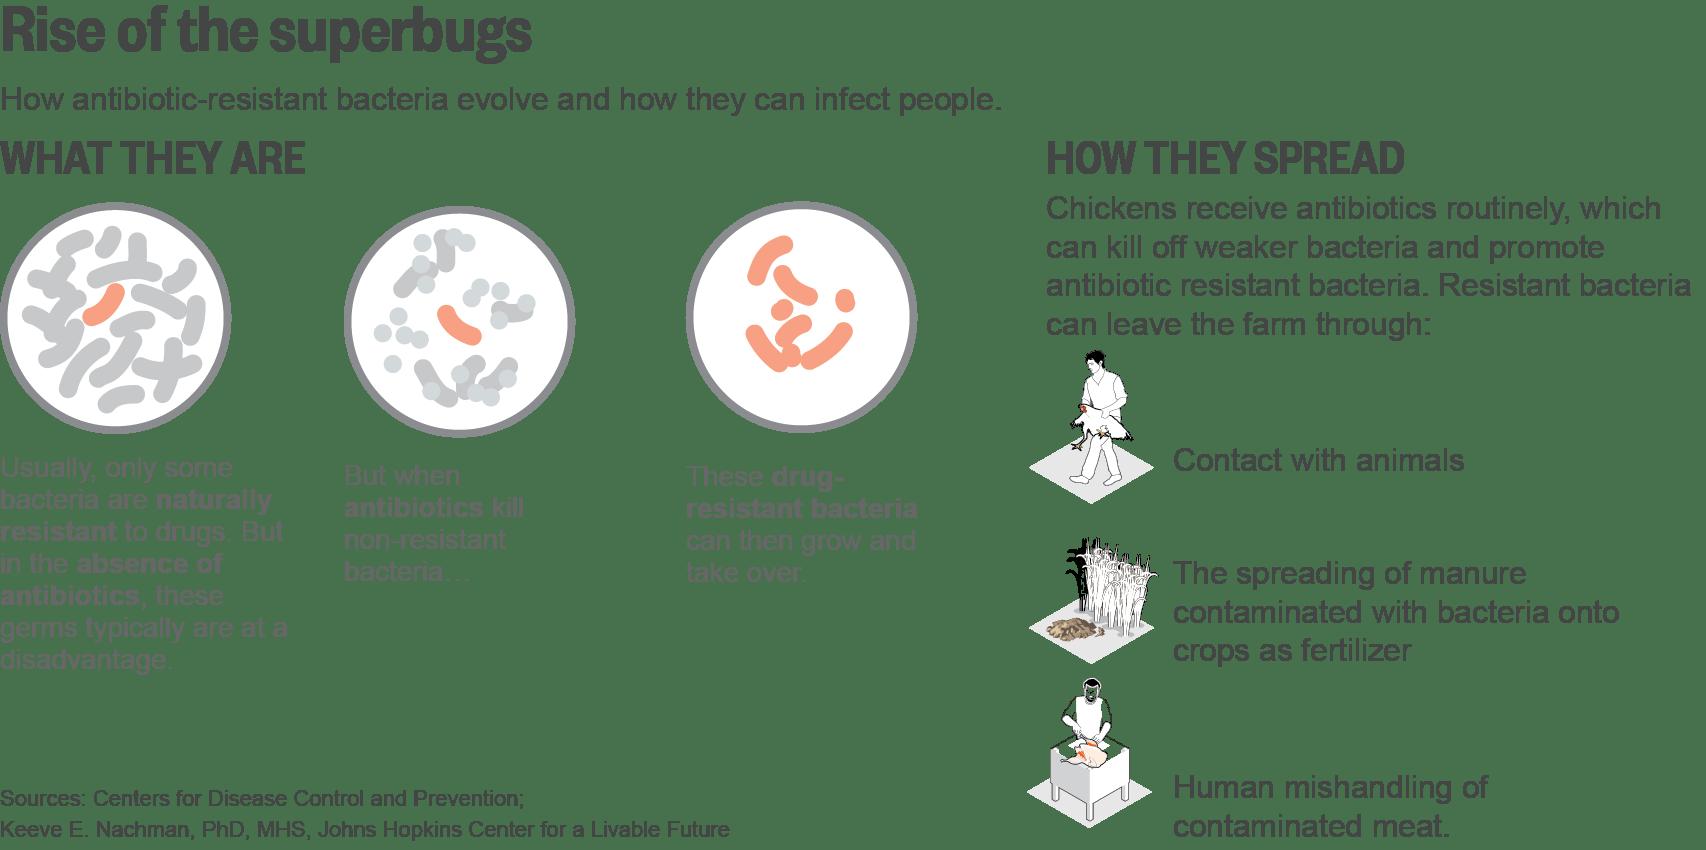 Farmaceuticals Vets Face Pressures To Prescribe